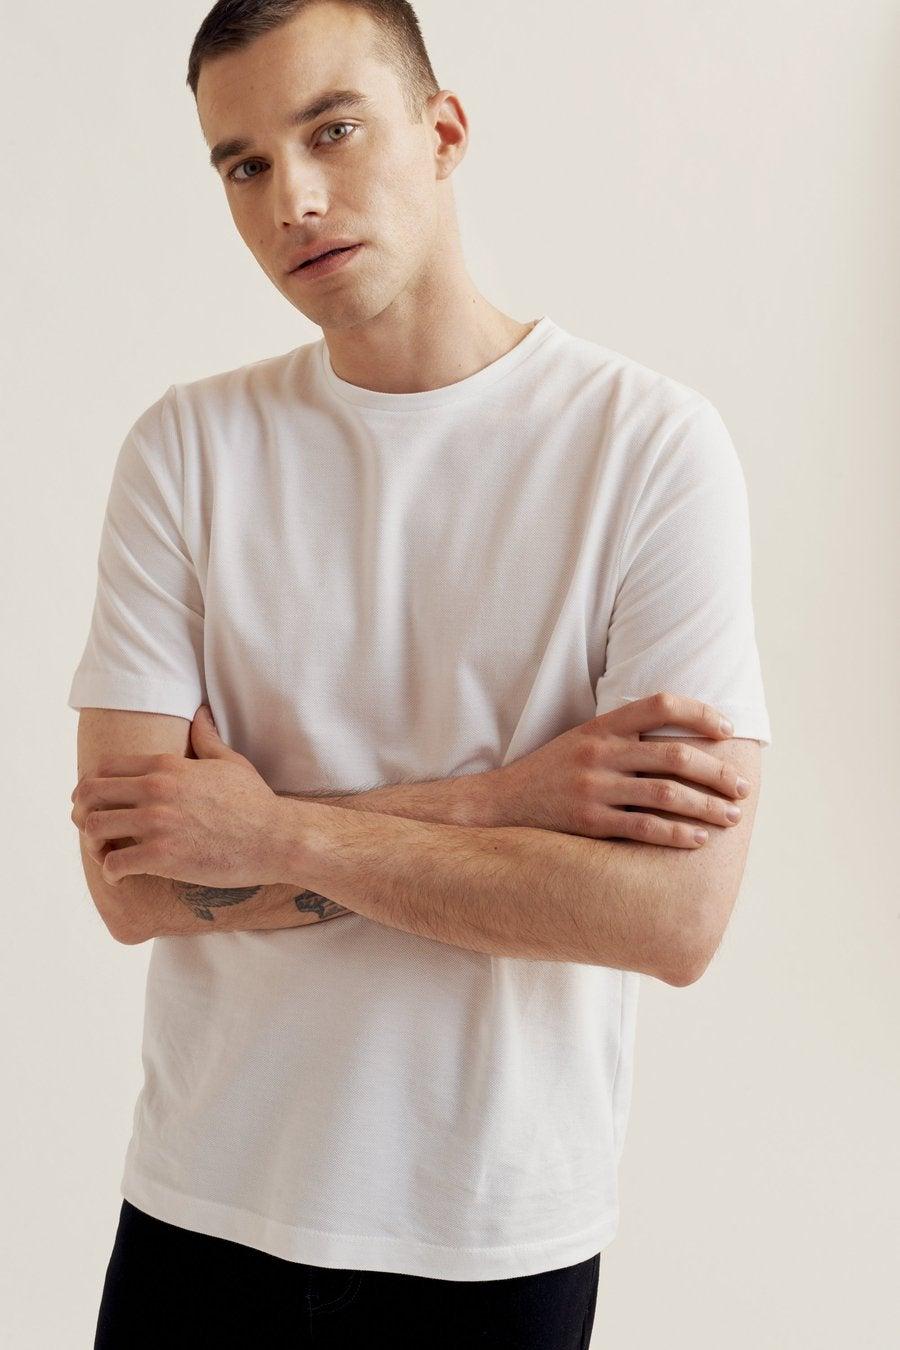 Essential for the modern man's wardrobe - Kotn T-Shirt Pique